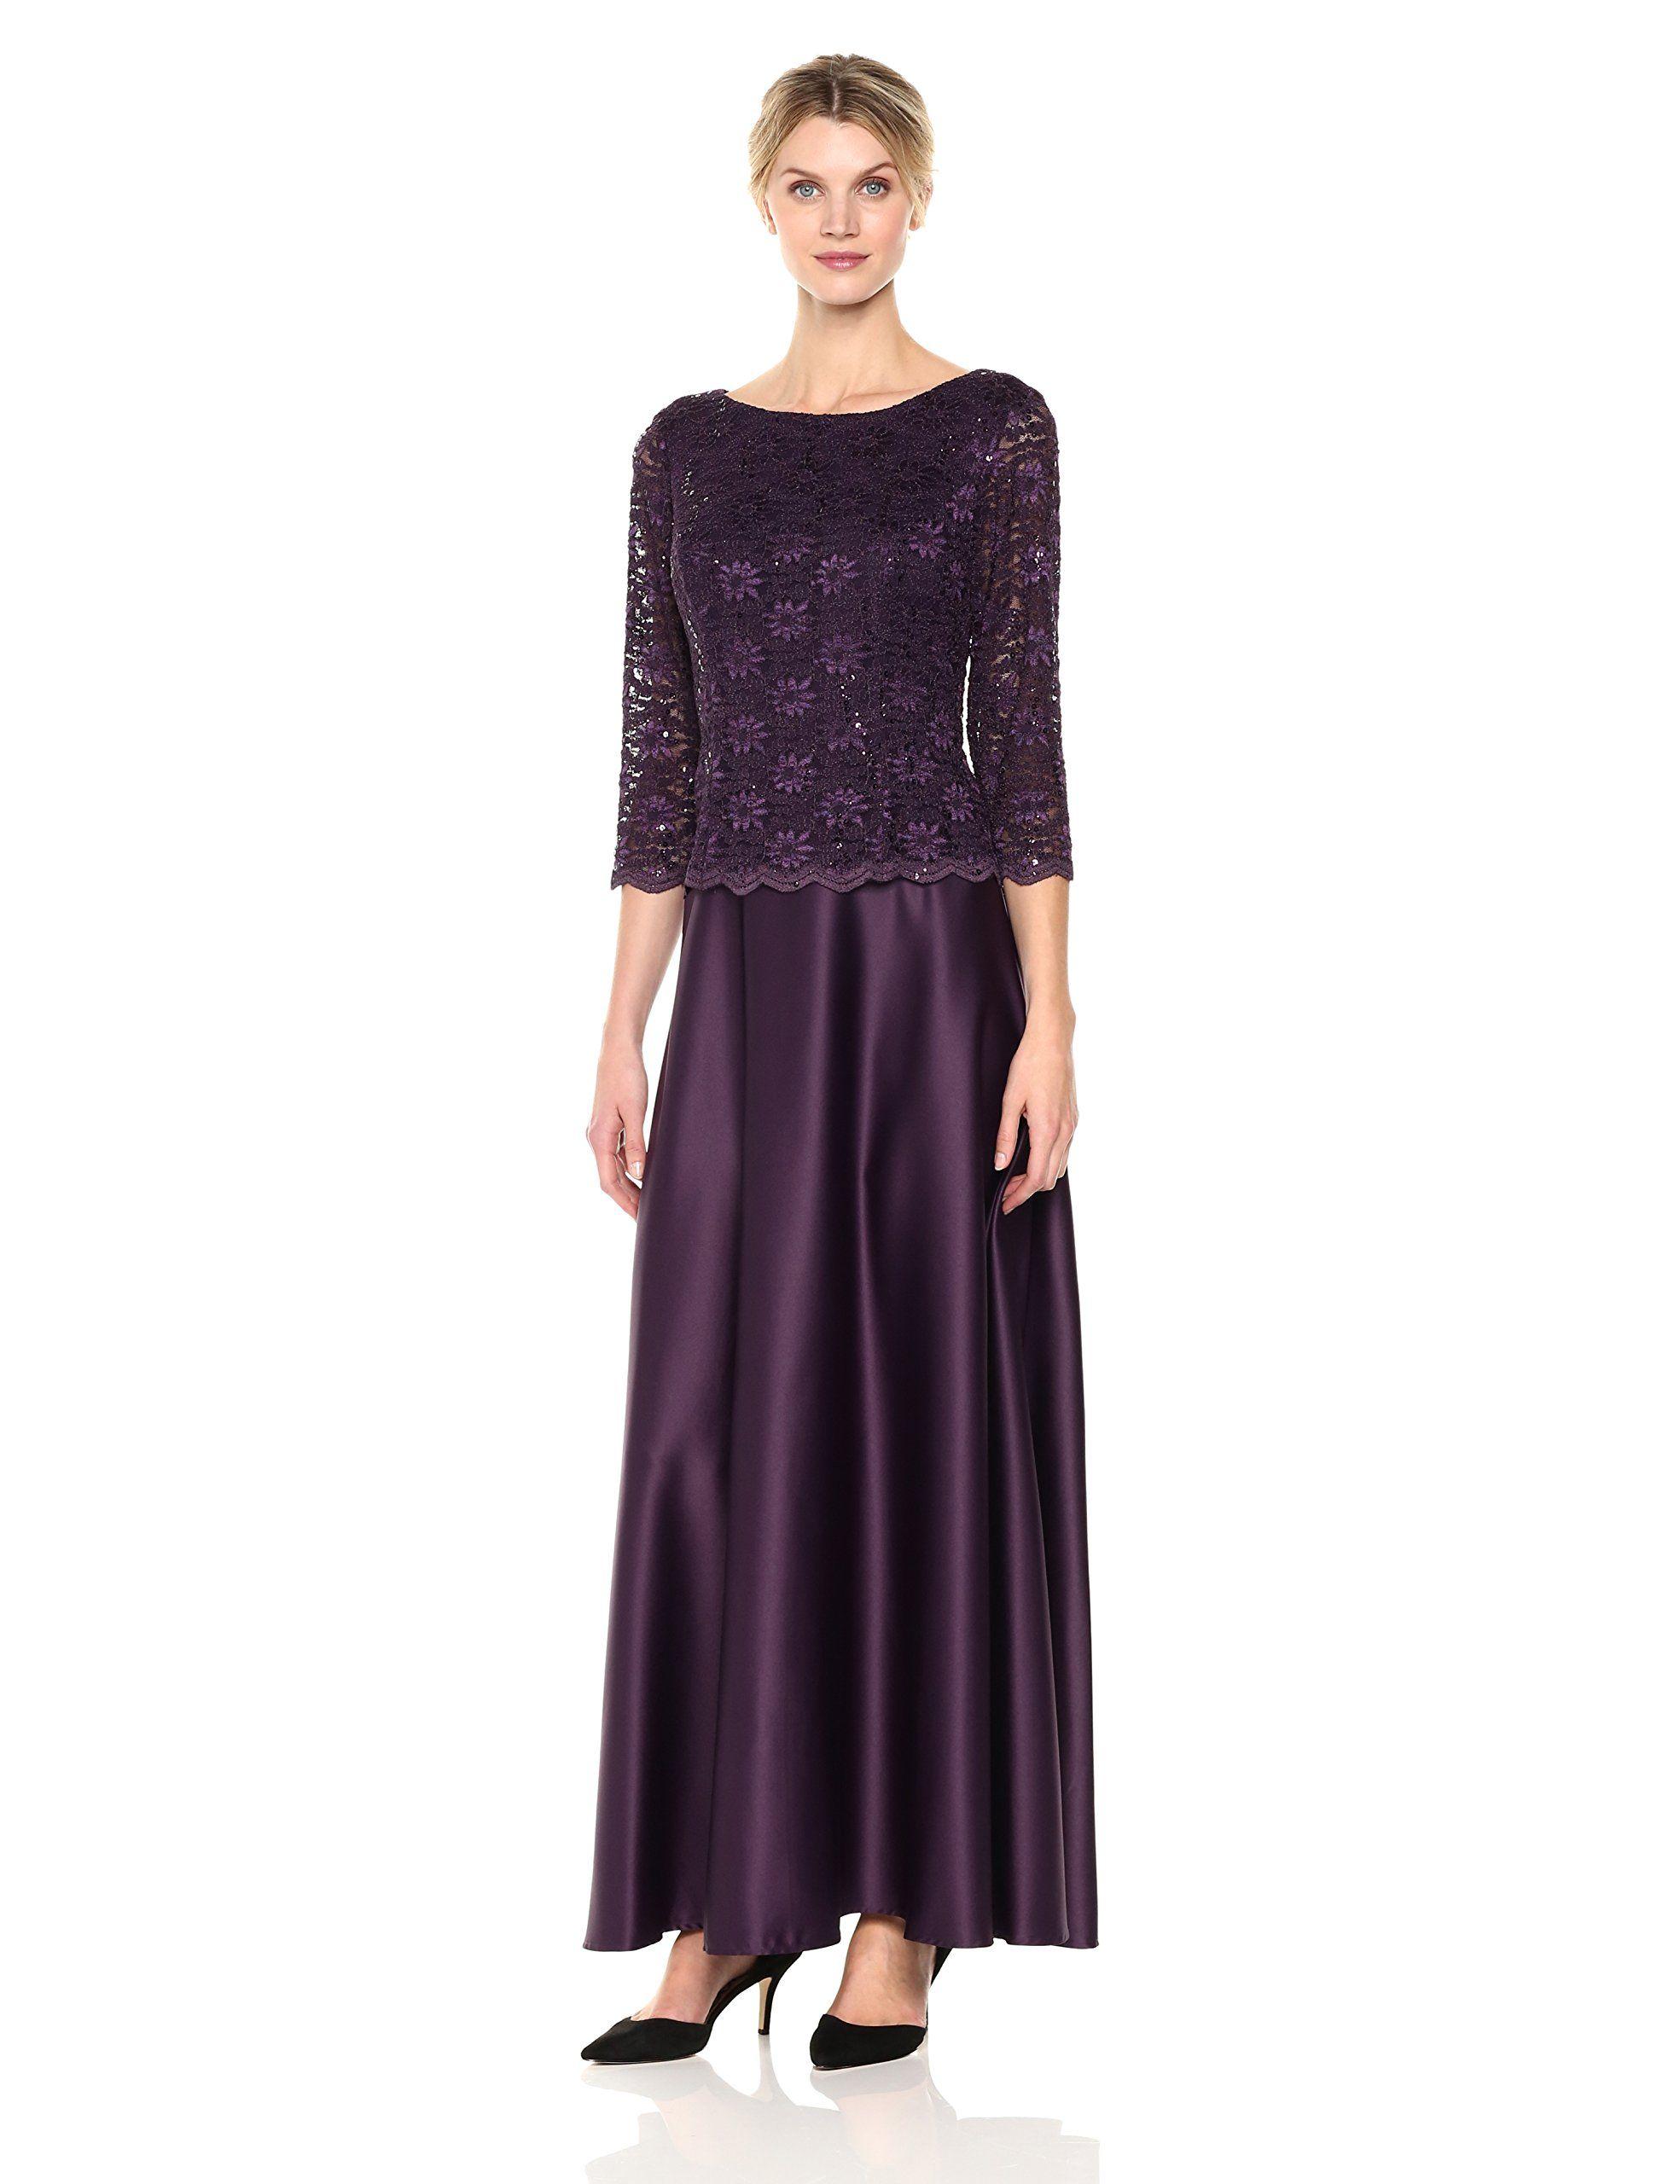 petite-plus-womens-evening-dresses